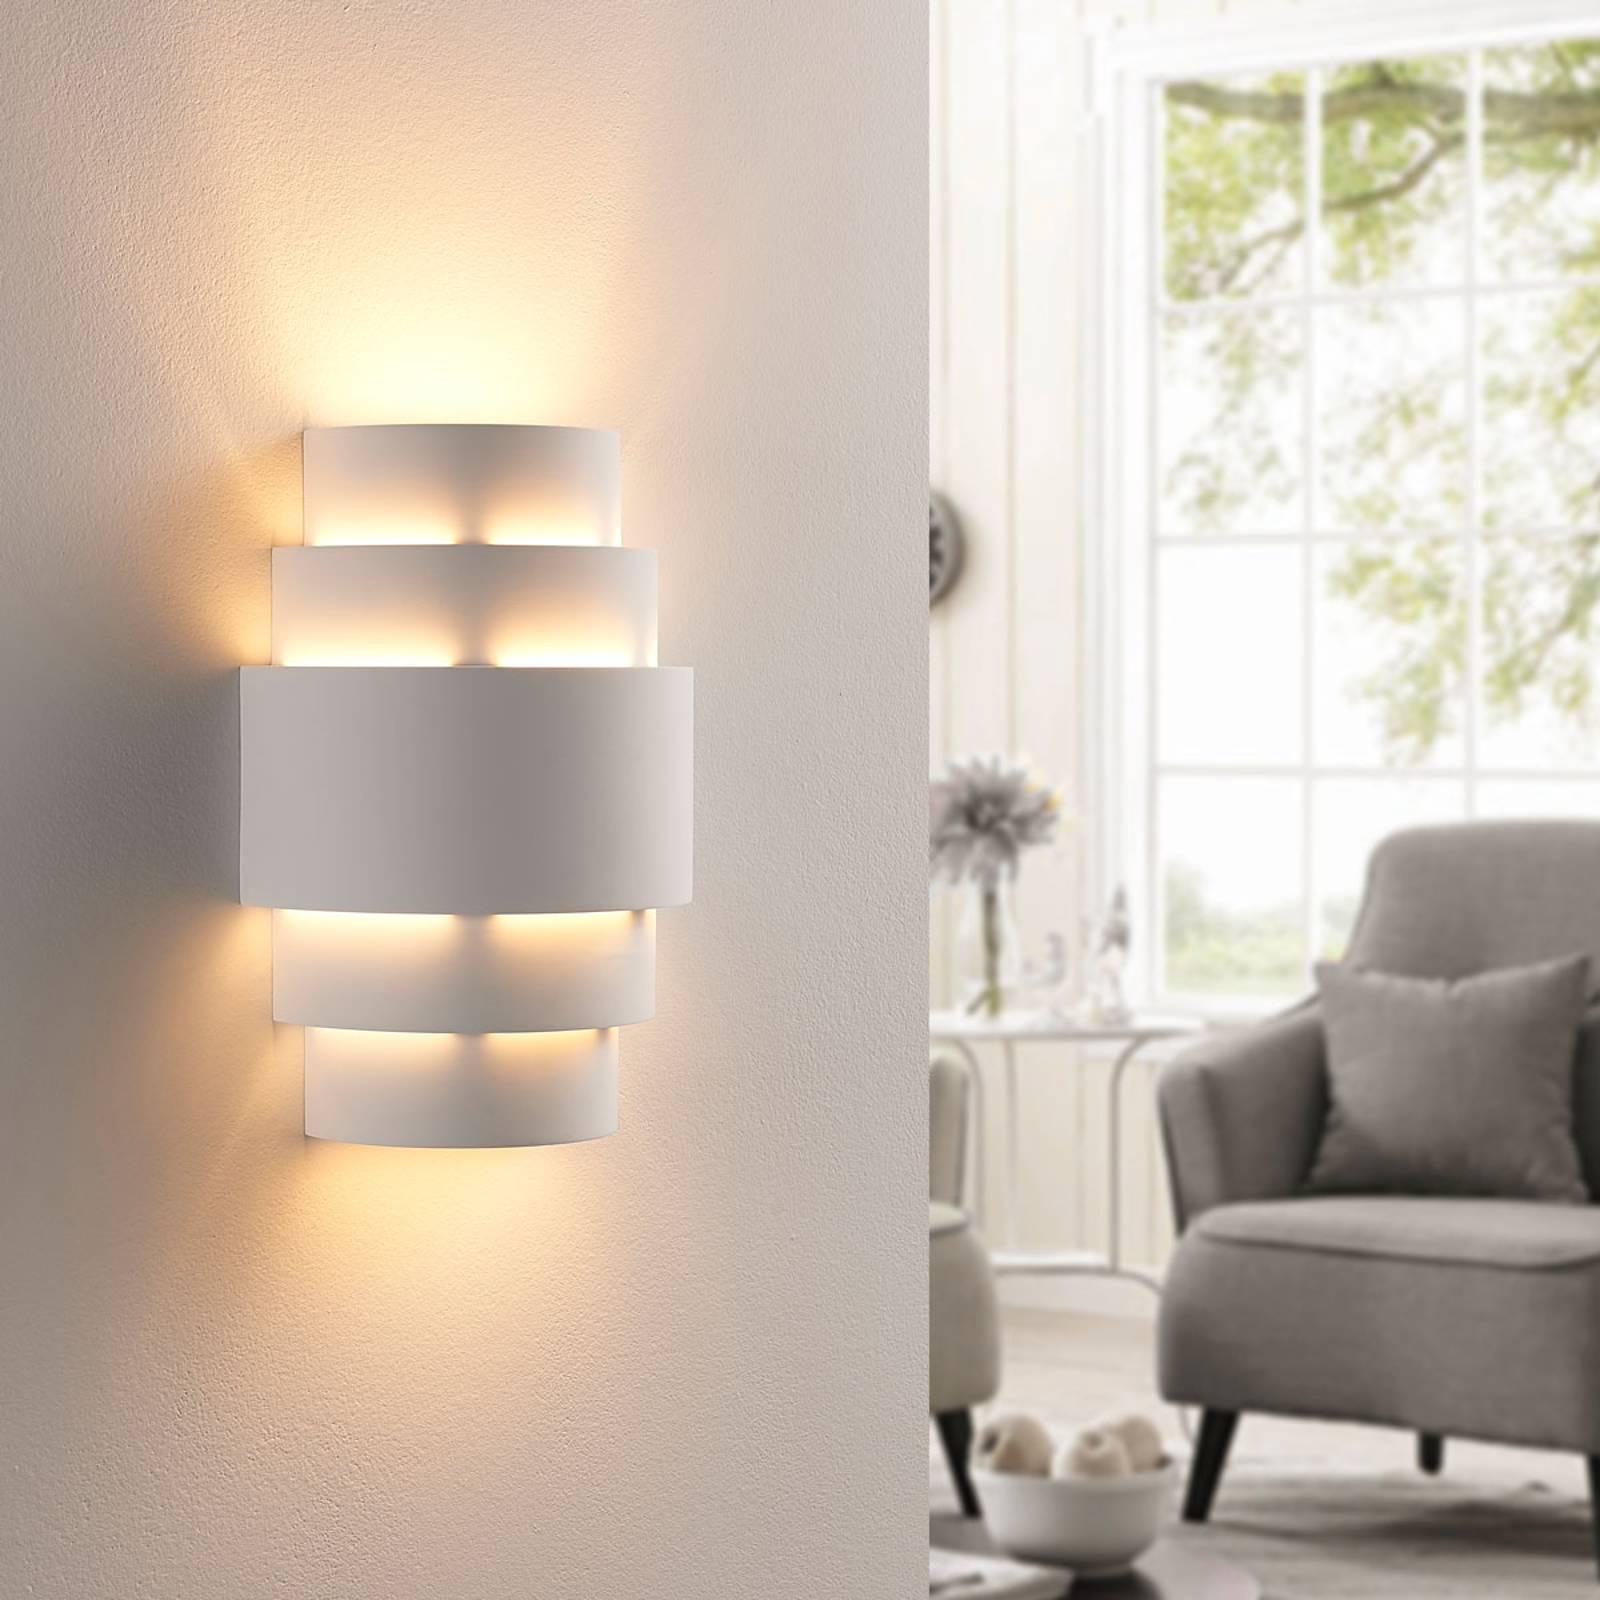 Trapvormige LED wandlamp Marit, easydim